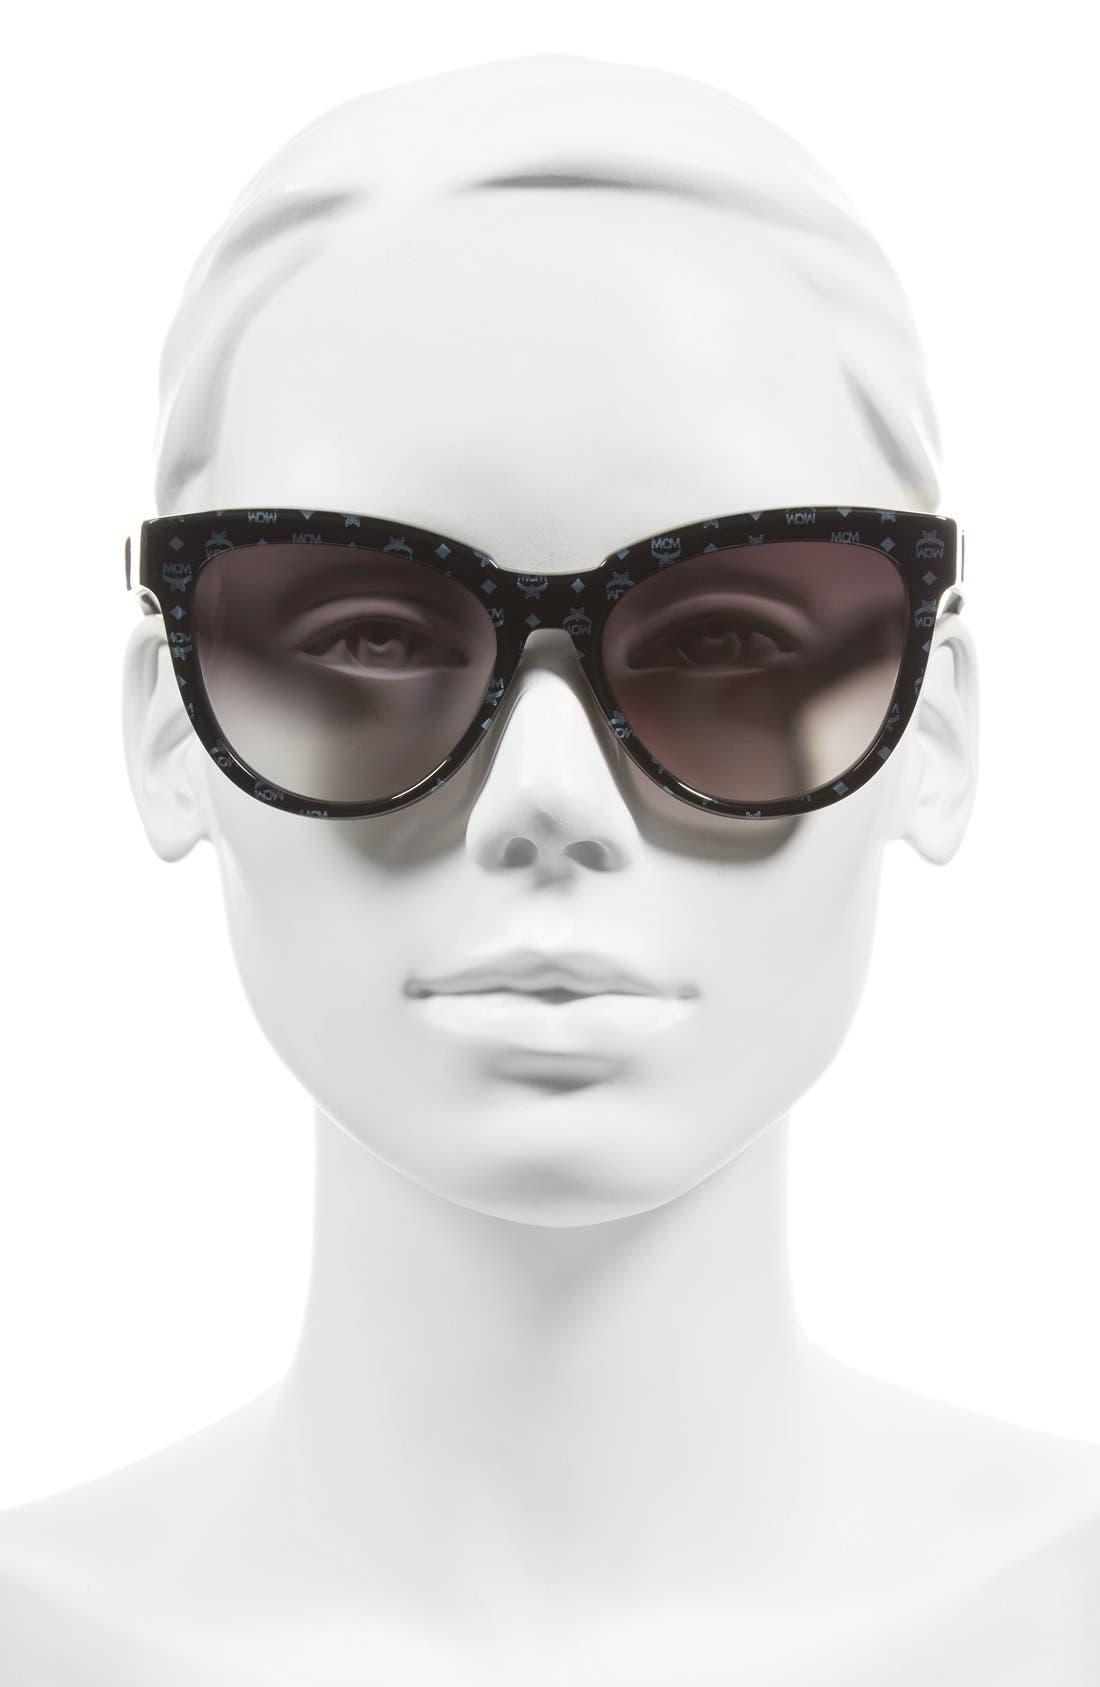 56mm Retro Sunglasses,                             Alternate thumbnail 2, color,                             006